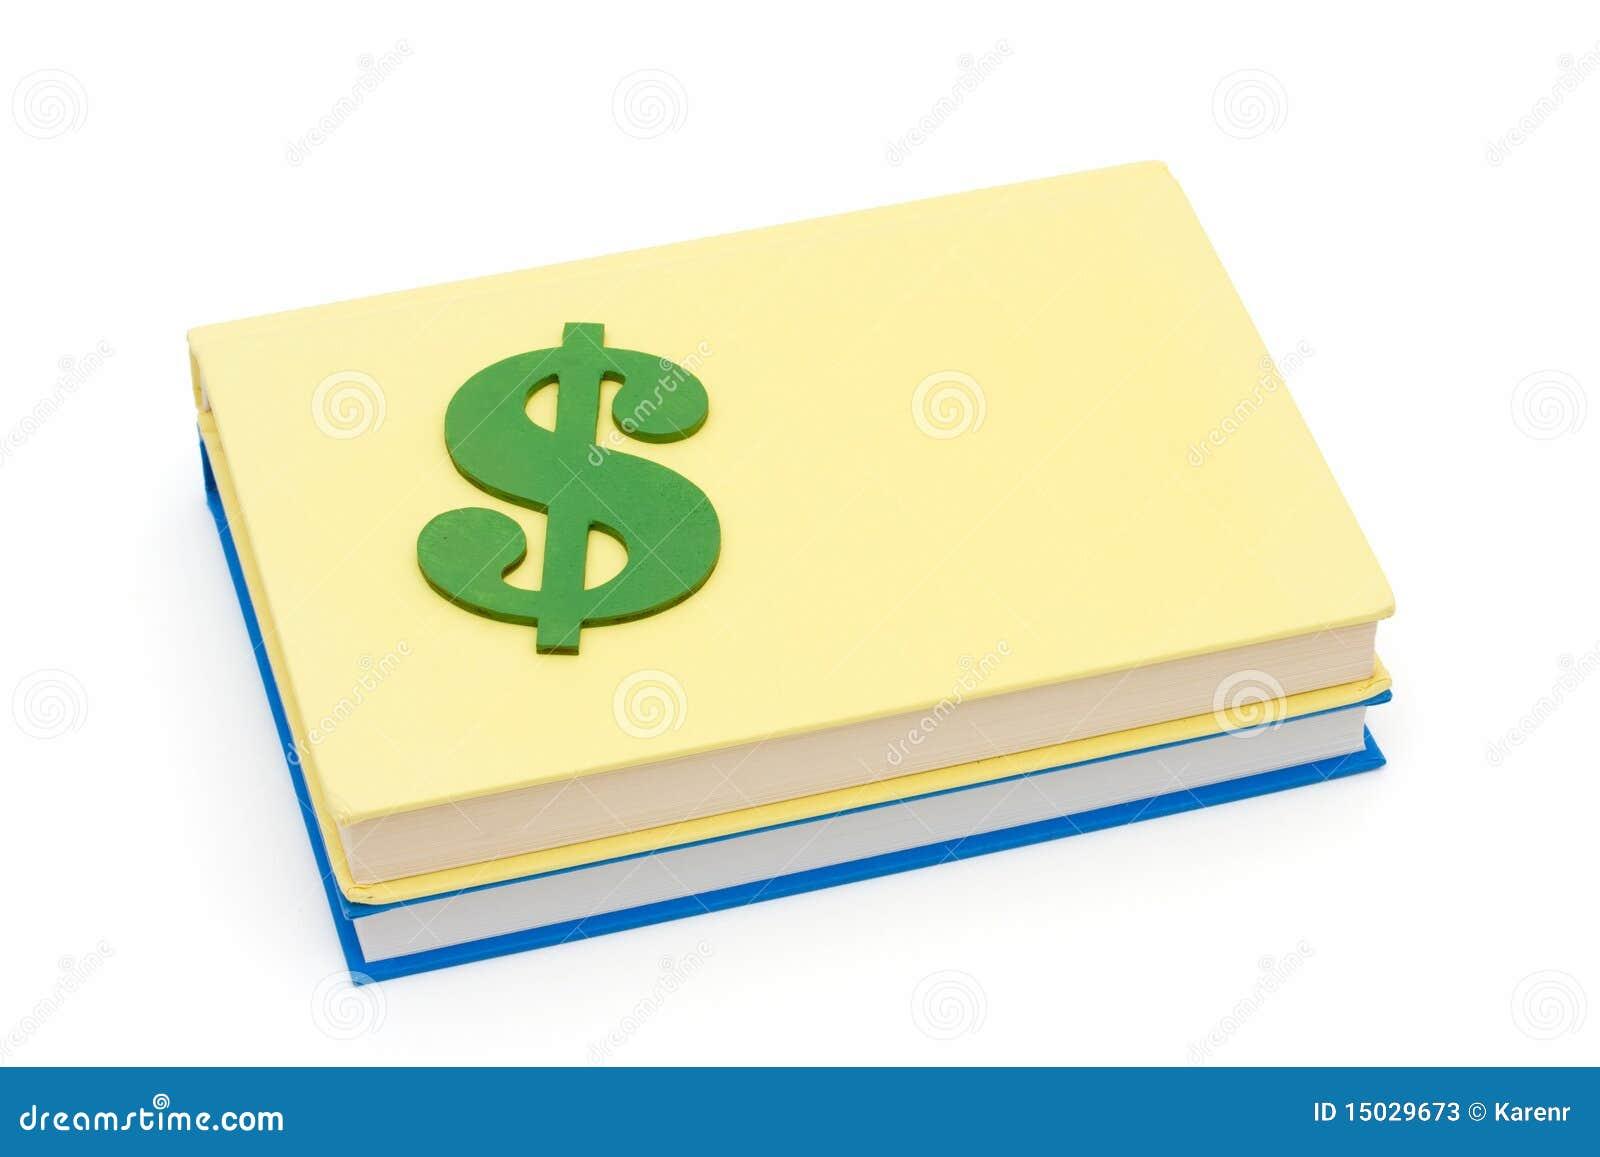 Education scholarships